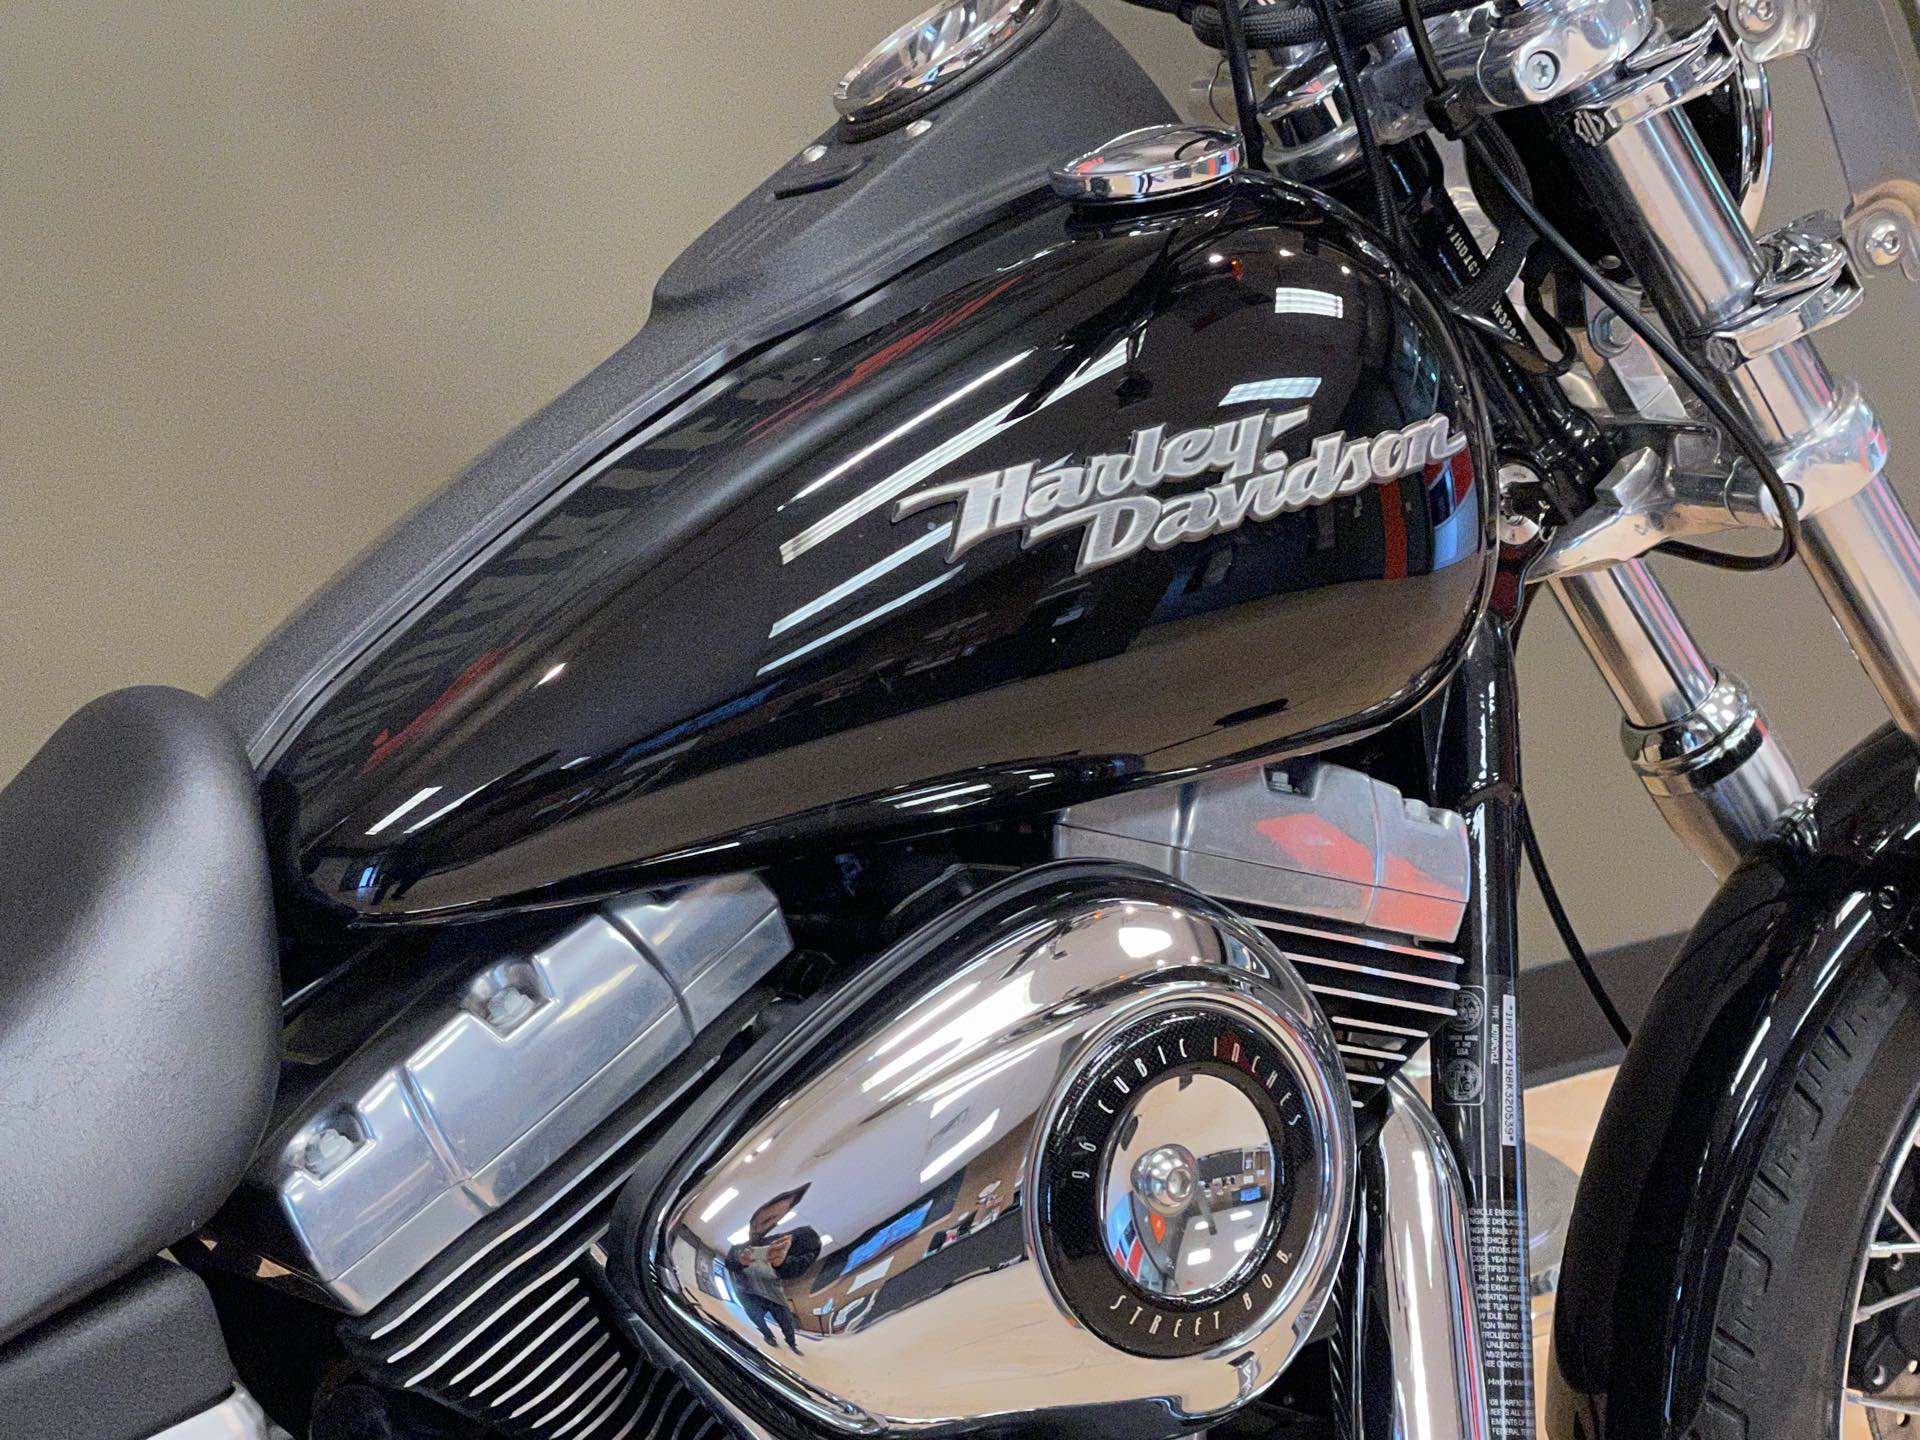 2008 Harley-Davidson Dyna Glide Street Bob at Loess Hills Harley-Davidson